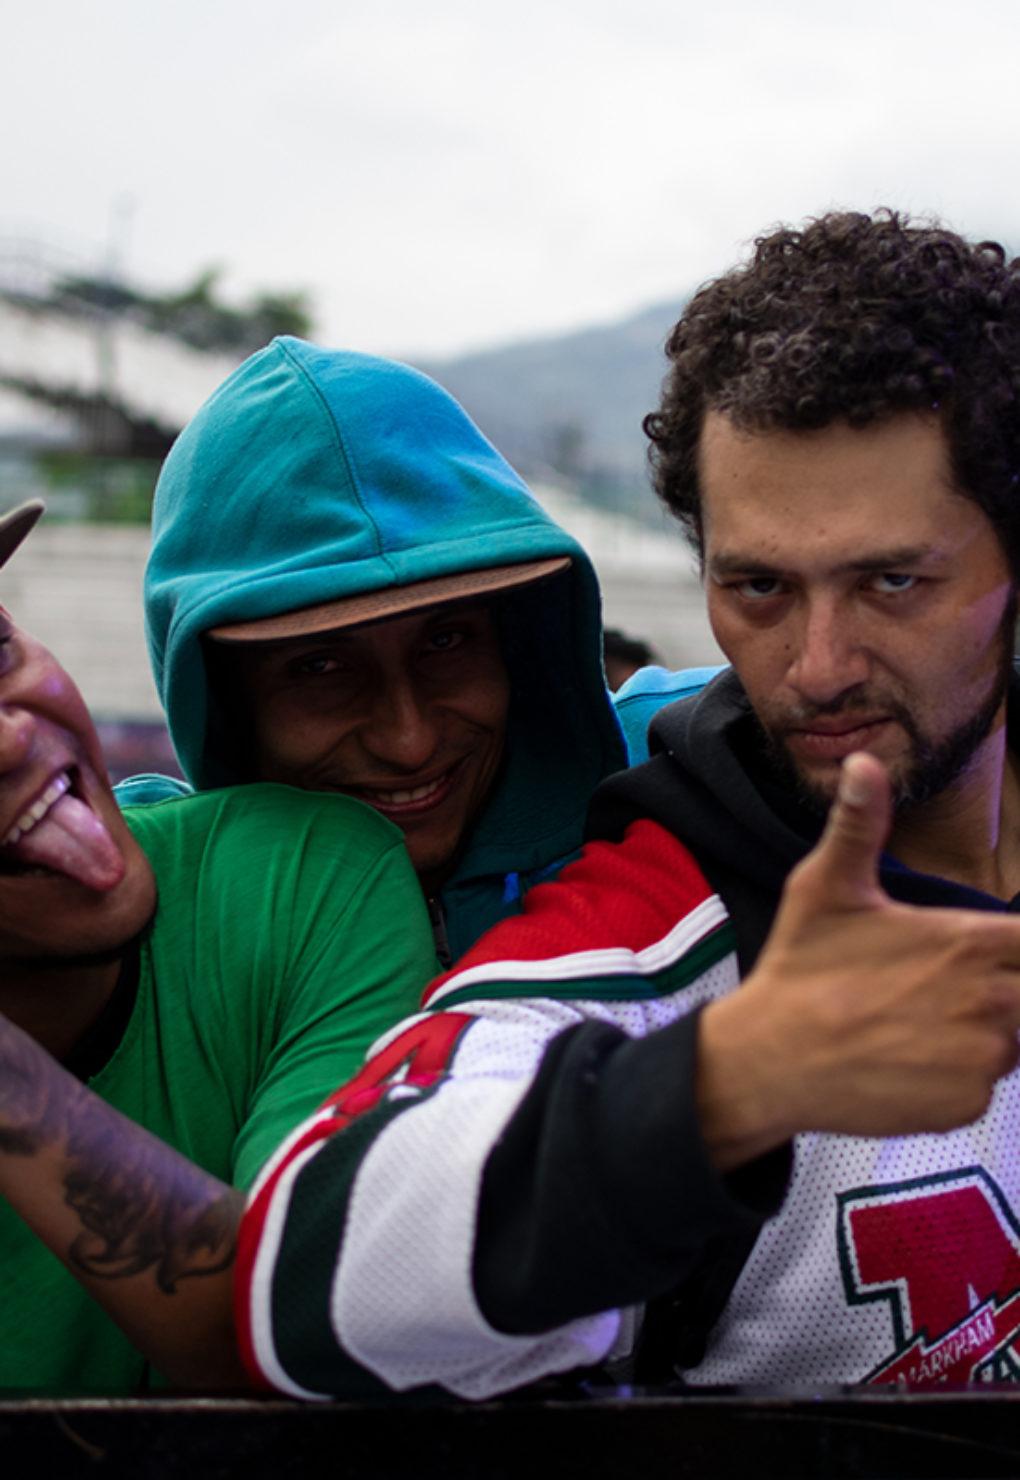 Asistentes al Festival Altavoz. Foto de Alejandro Valencia Carmona.